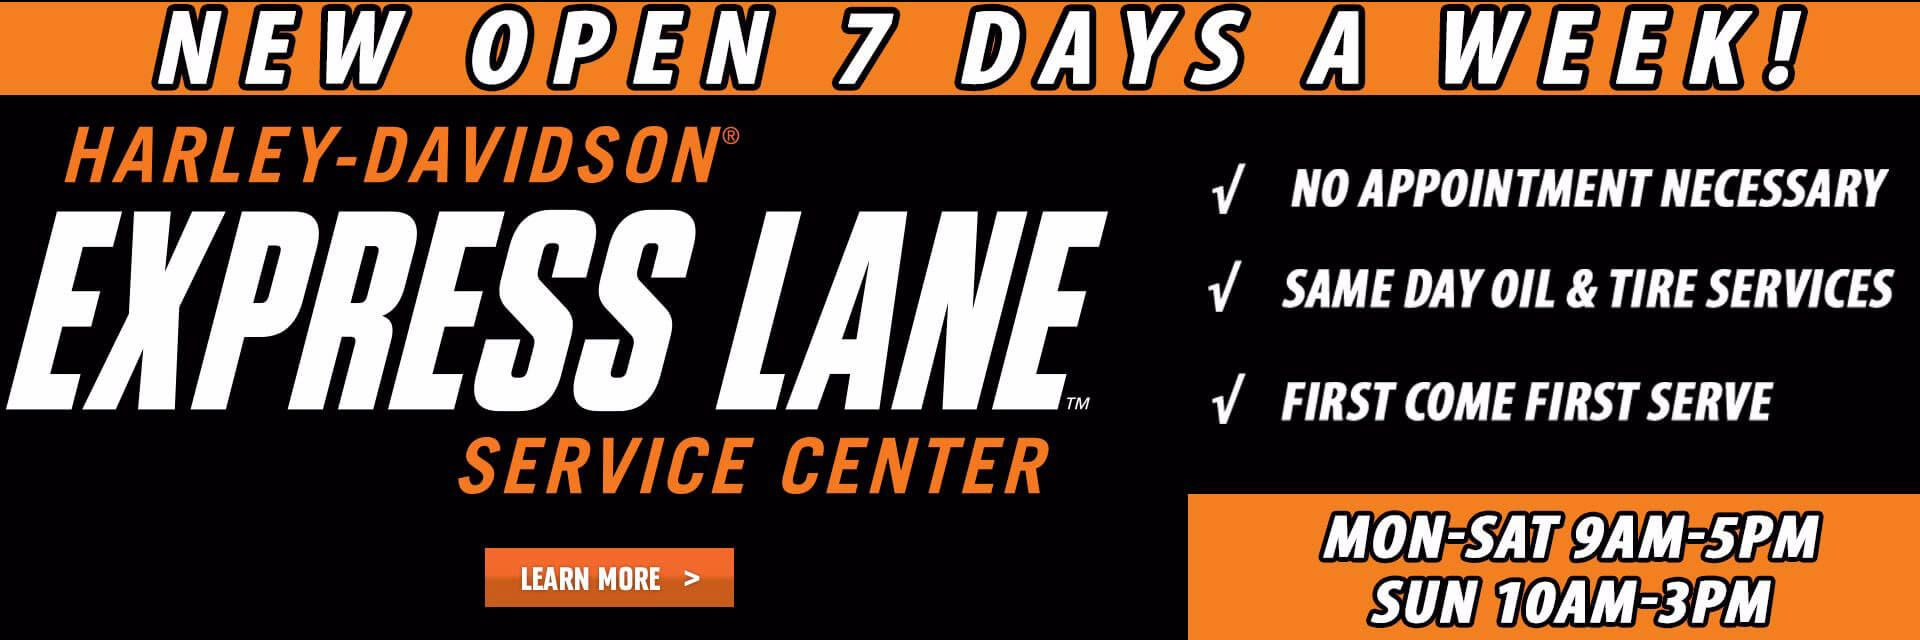 Superstition Harley-Davidson® Express Lane Now Open Sever Days a Week!